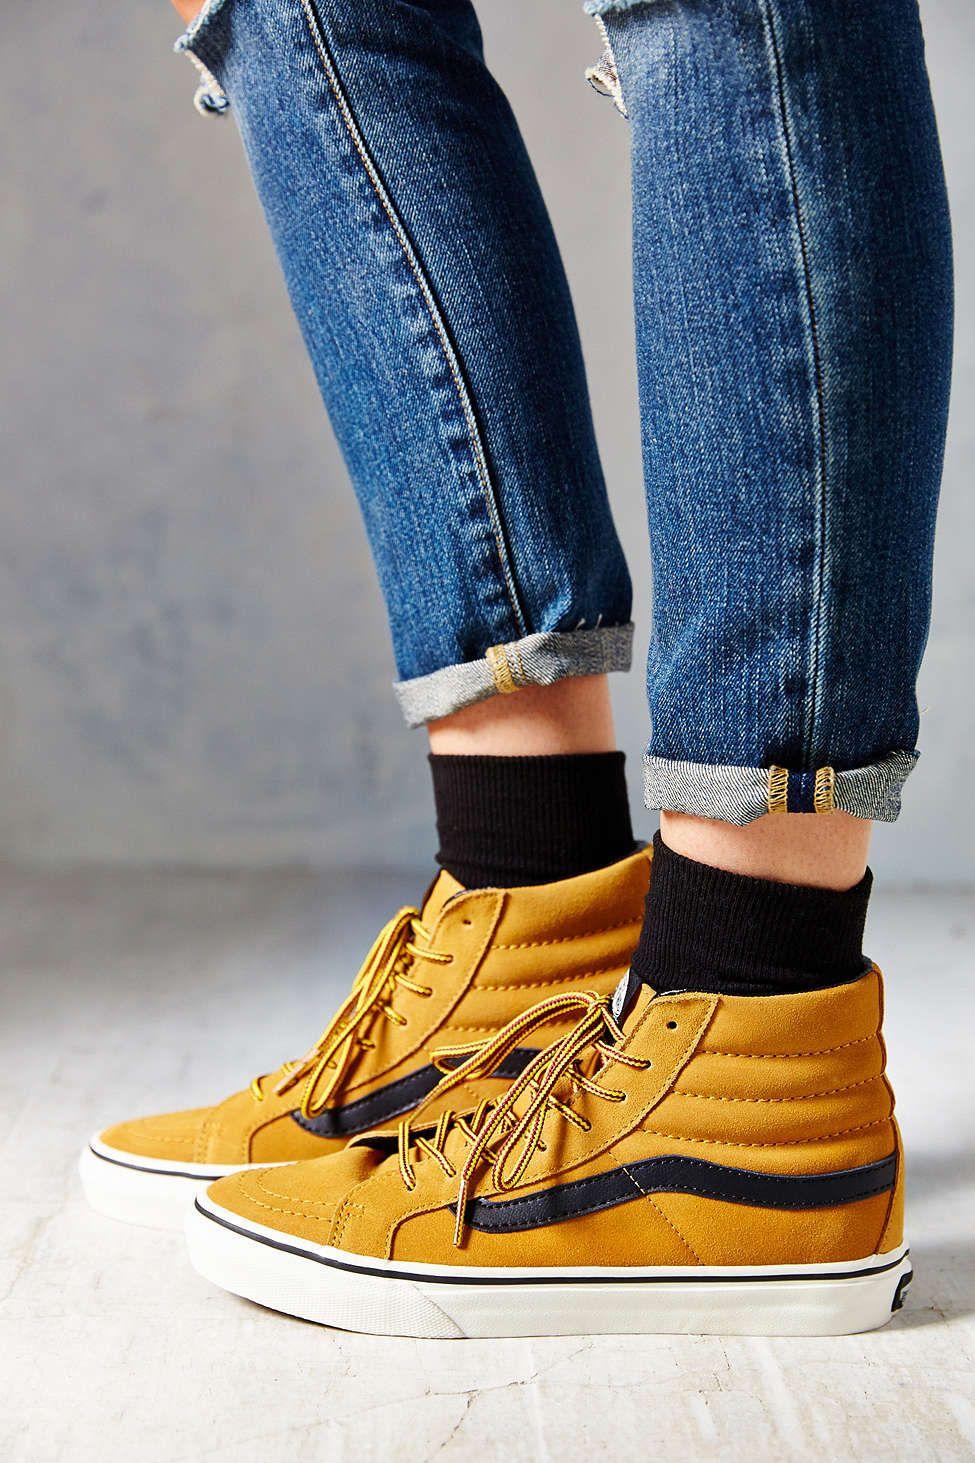 df9ade4e52 Vans Sk8-Hi Slim Hiker Womens High-Top Sneaker - Urban Outfitters ...